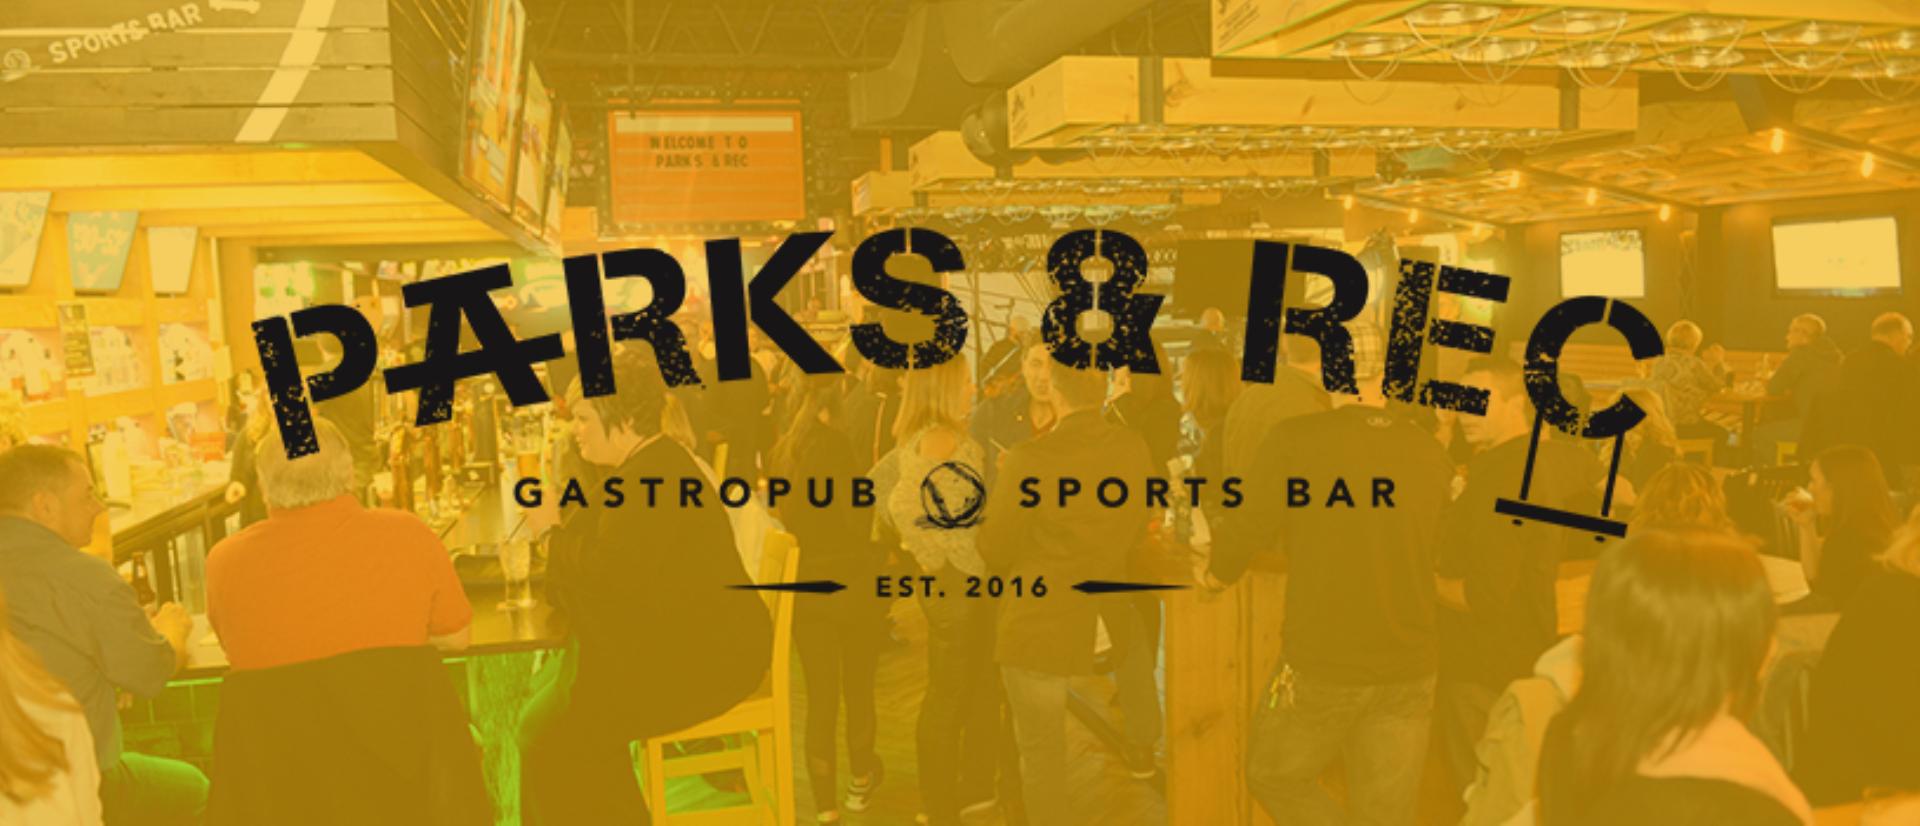 Parks & Rec Gastropub Sports Bar Restaurant - Picture